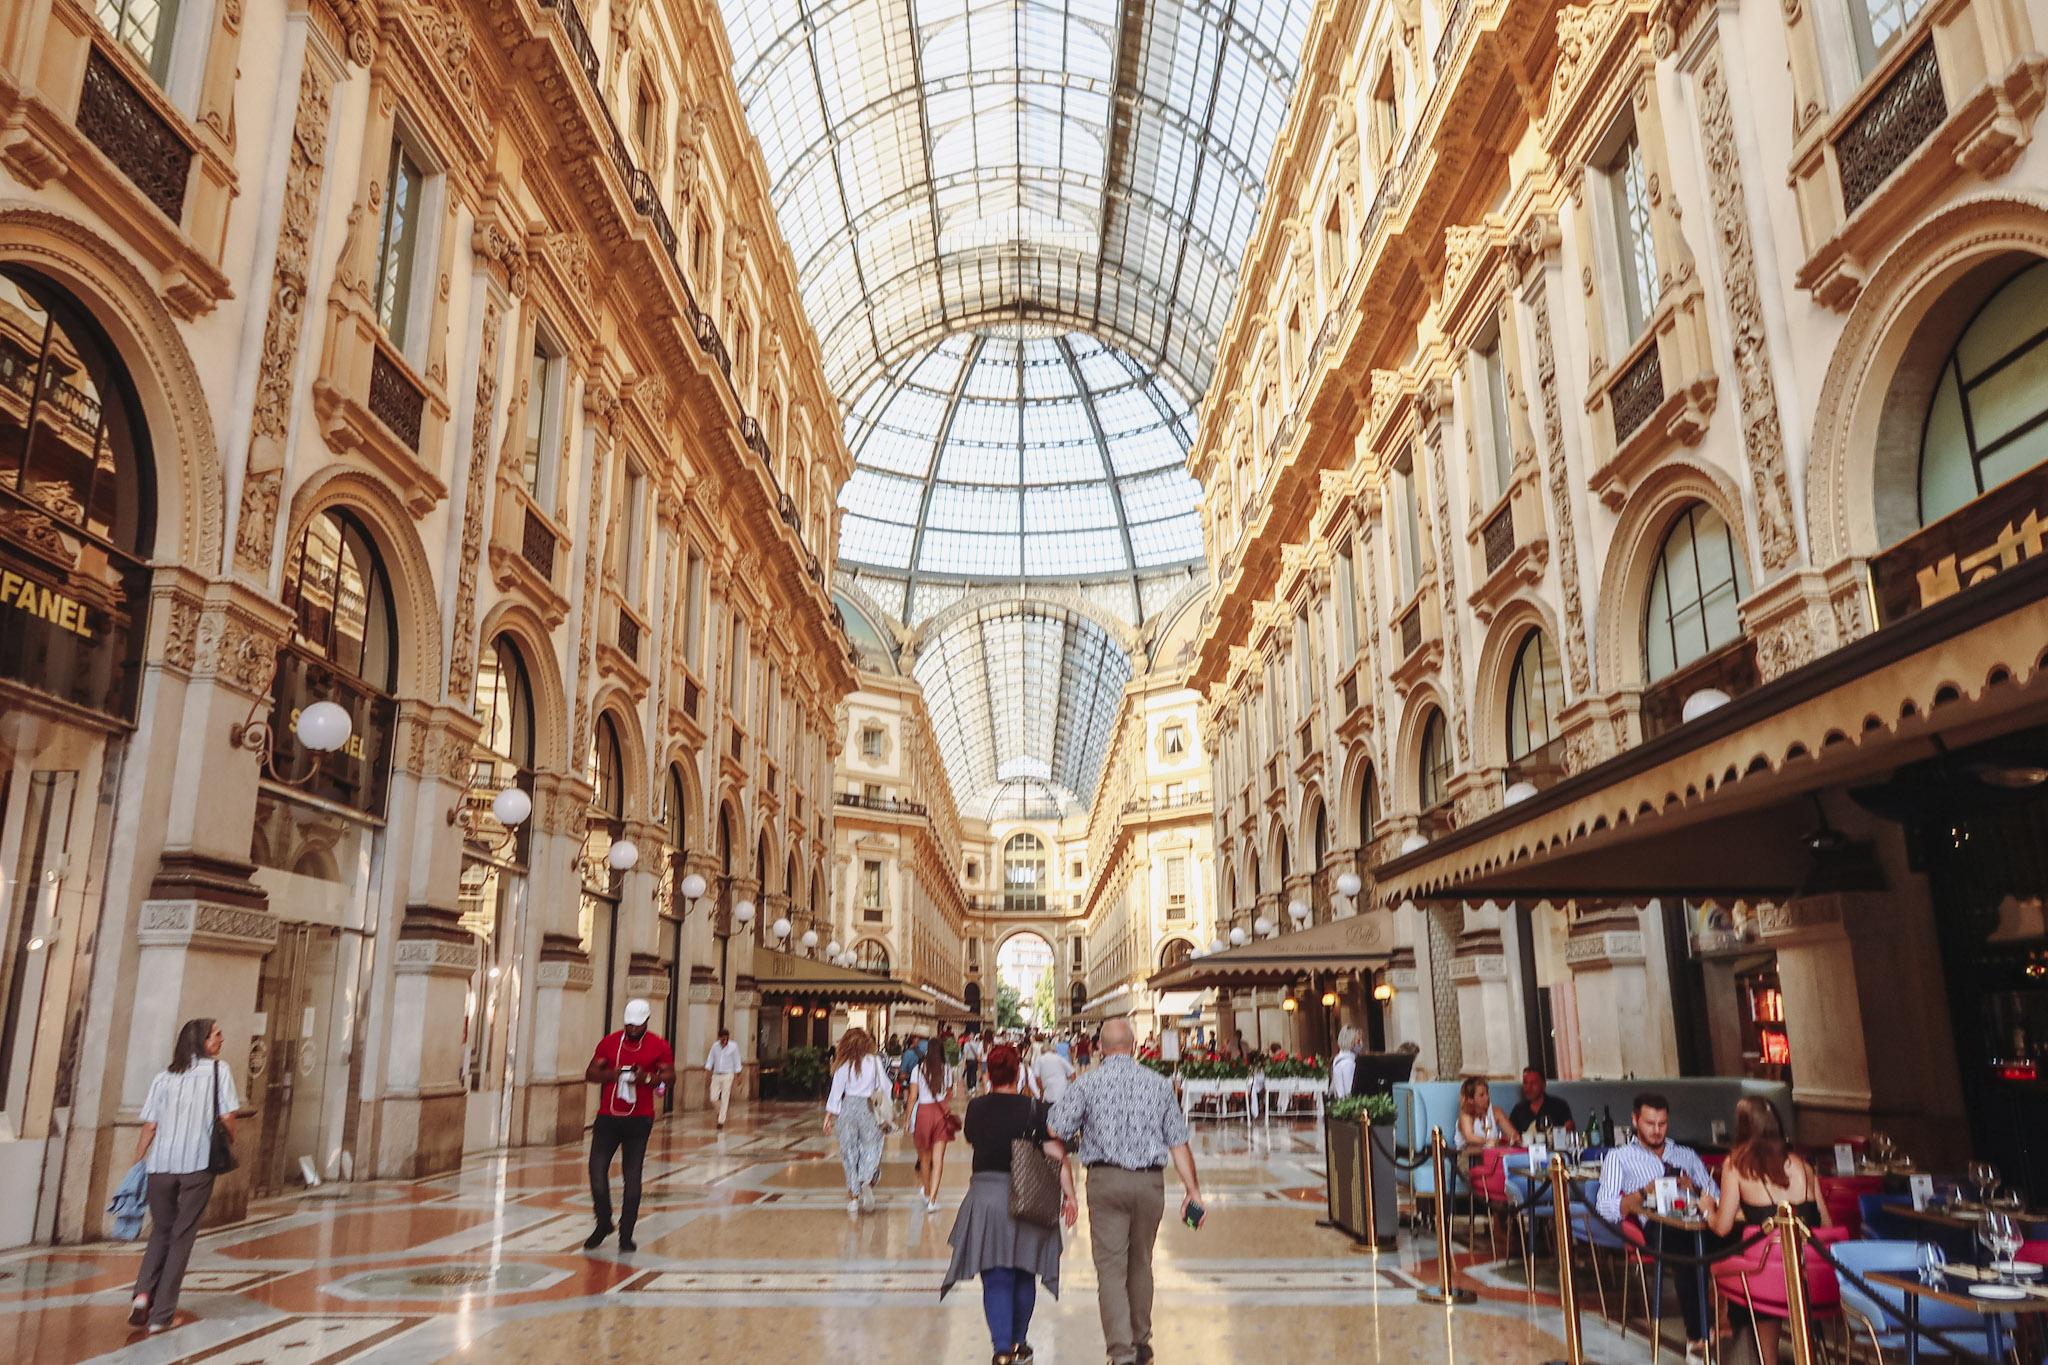 History of Galleria Vittorio Emanuele II next to the Duomo in Milano